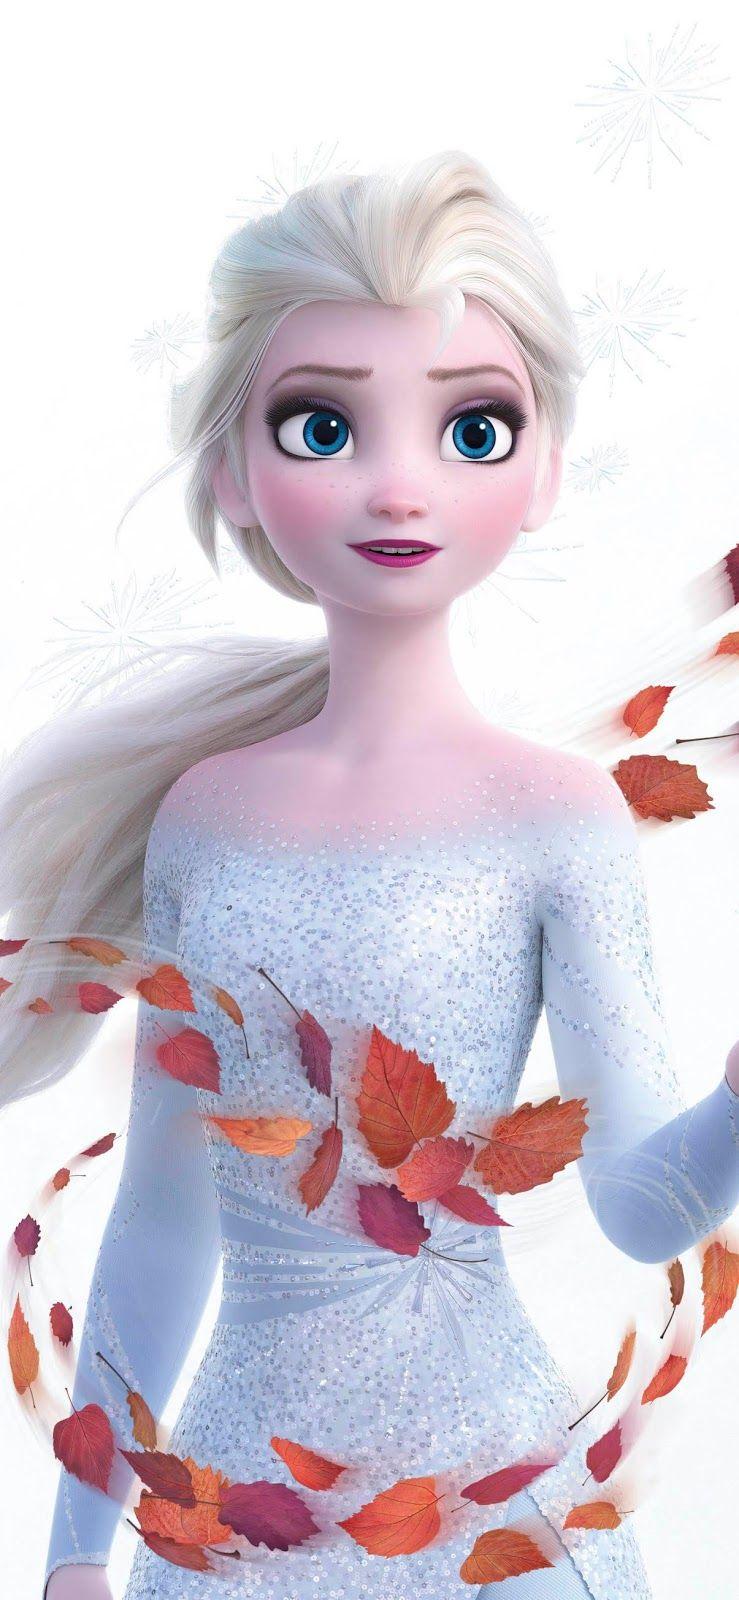 My Favorite Pics Frozen 2 Elsa Mobile Wallpaper Imagens De Disney Wallpaper Iphone Disney Princess Princesa Disney Frozen